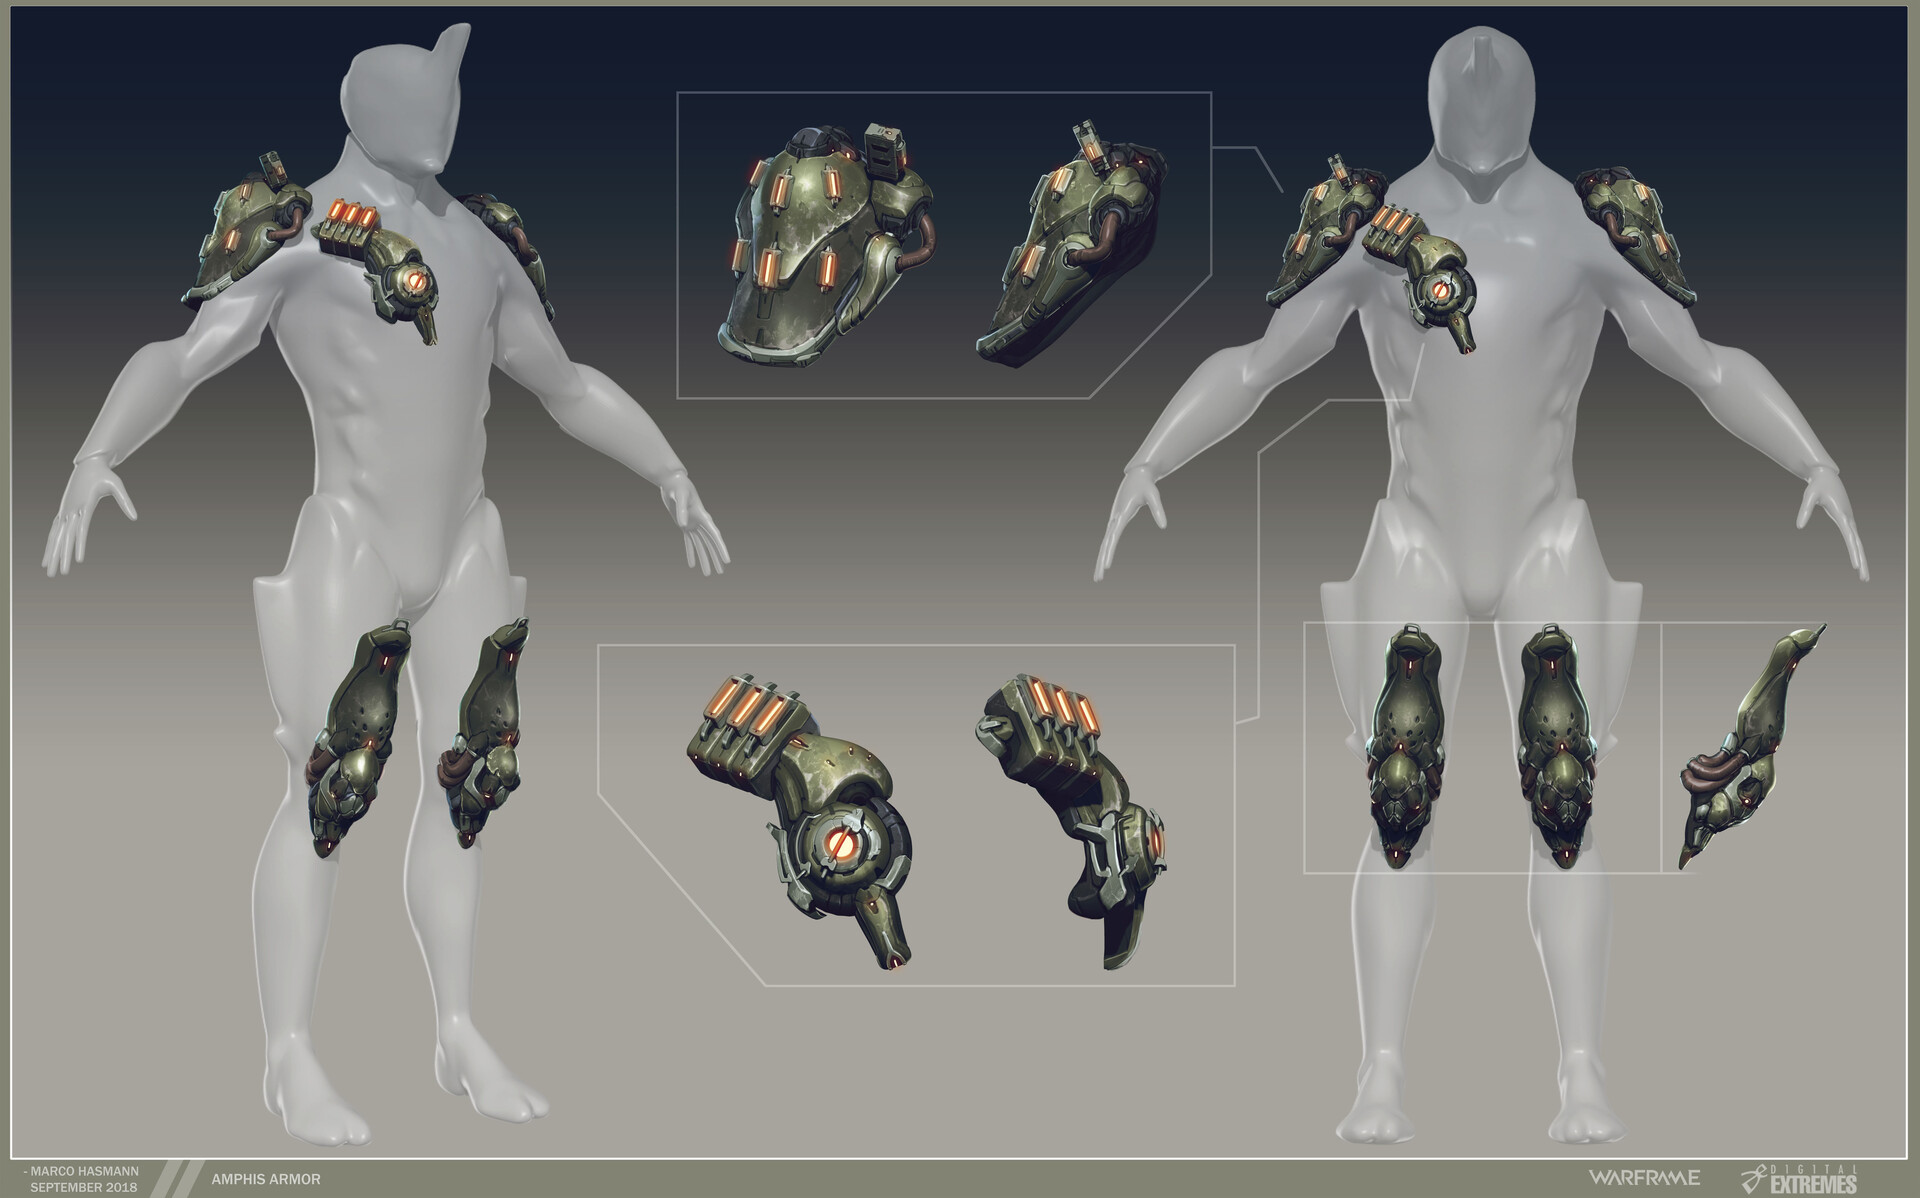 Marco hasmann mh amphis armor